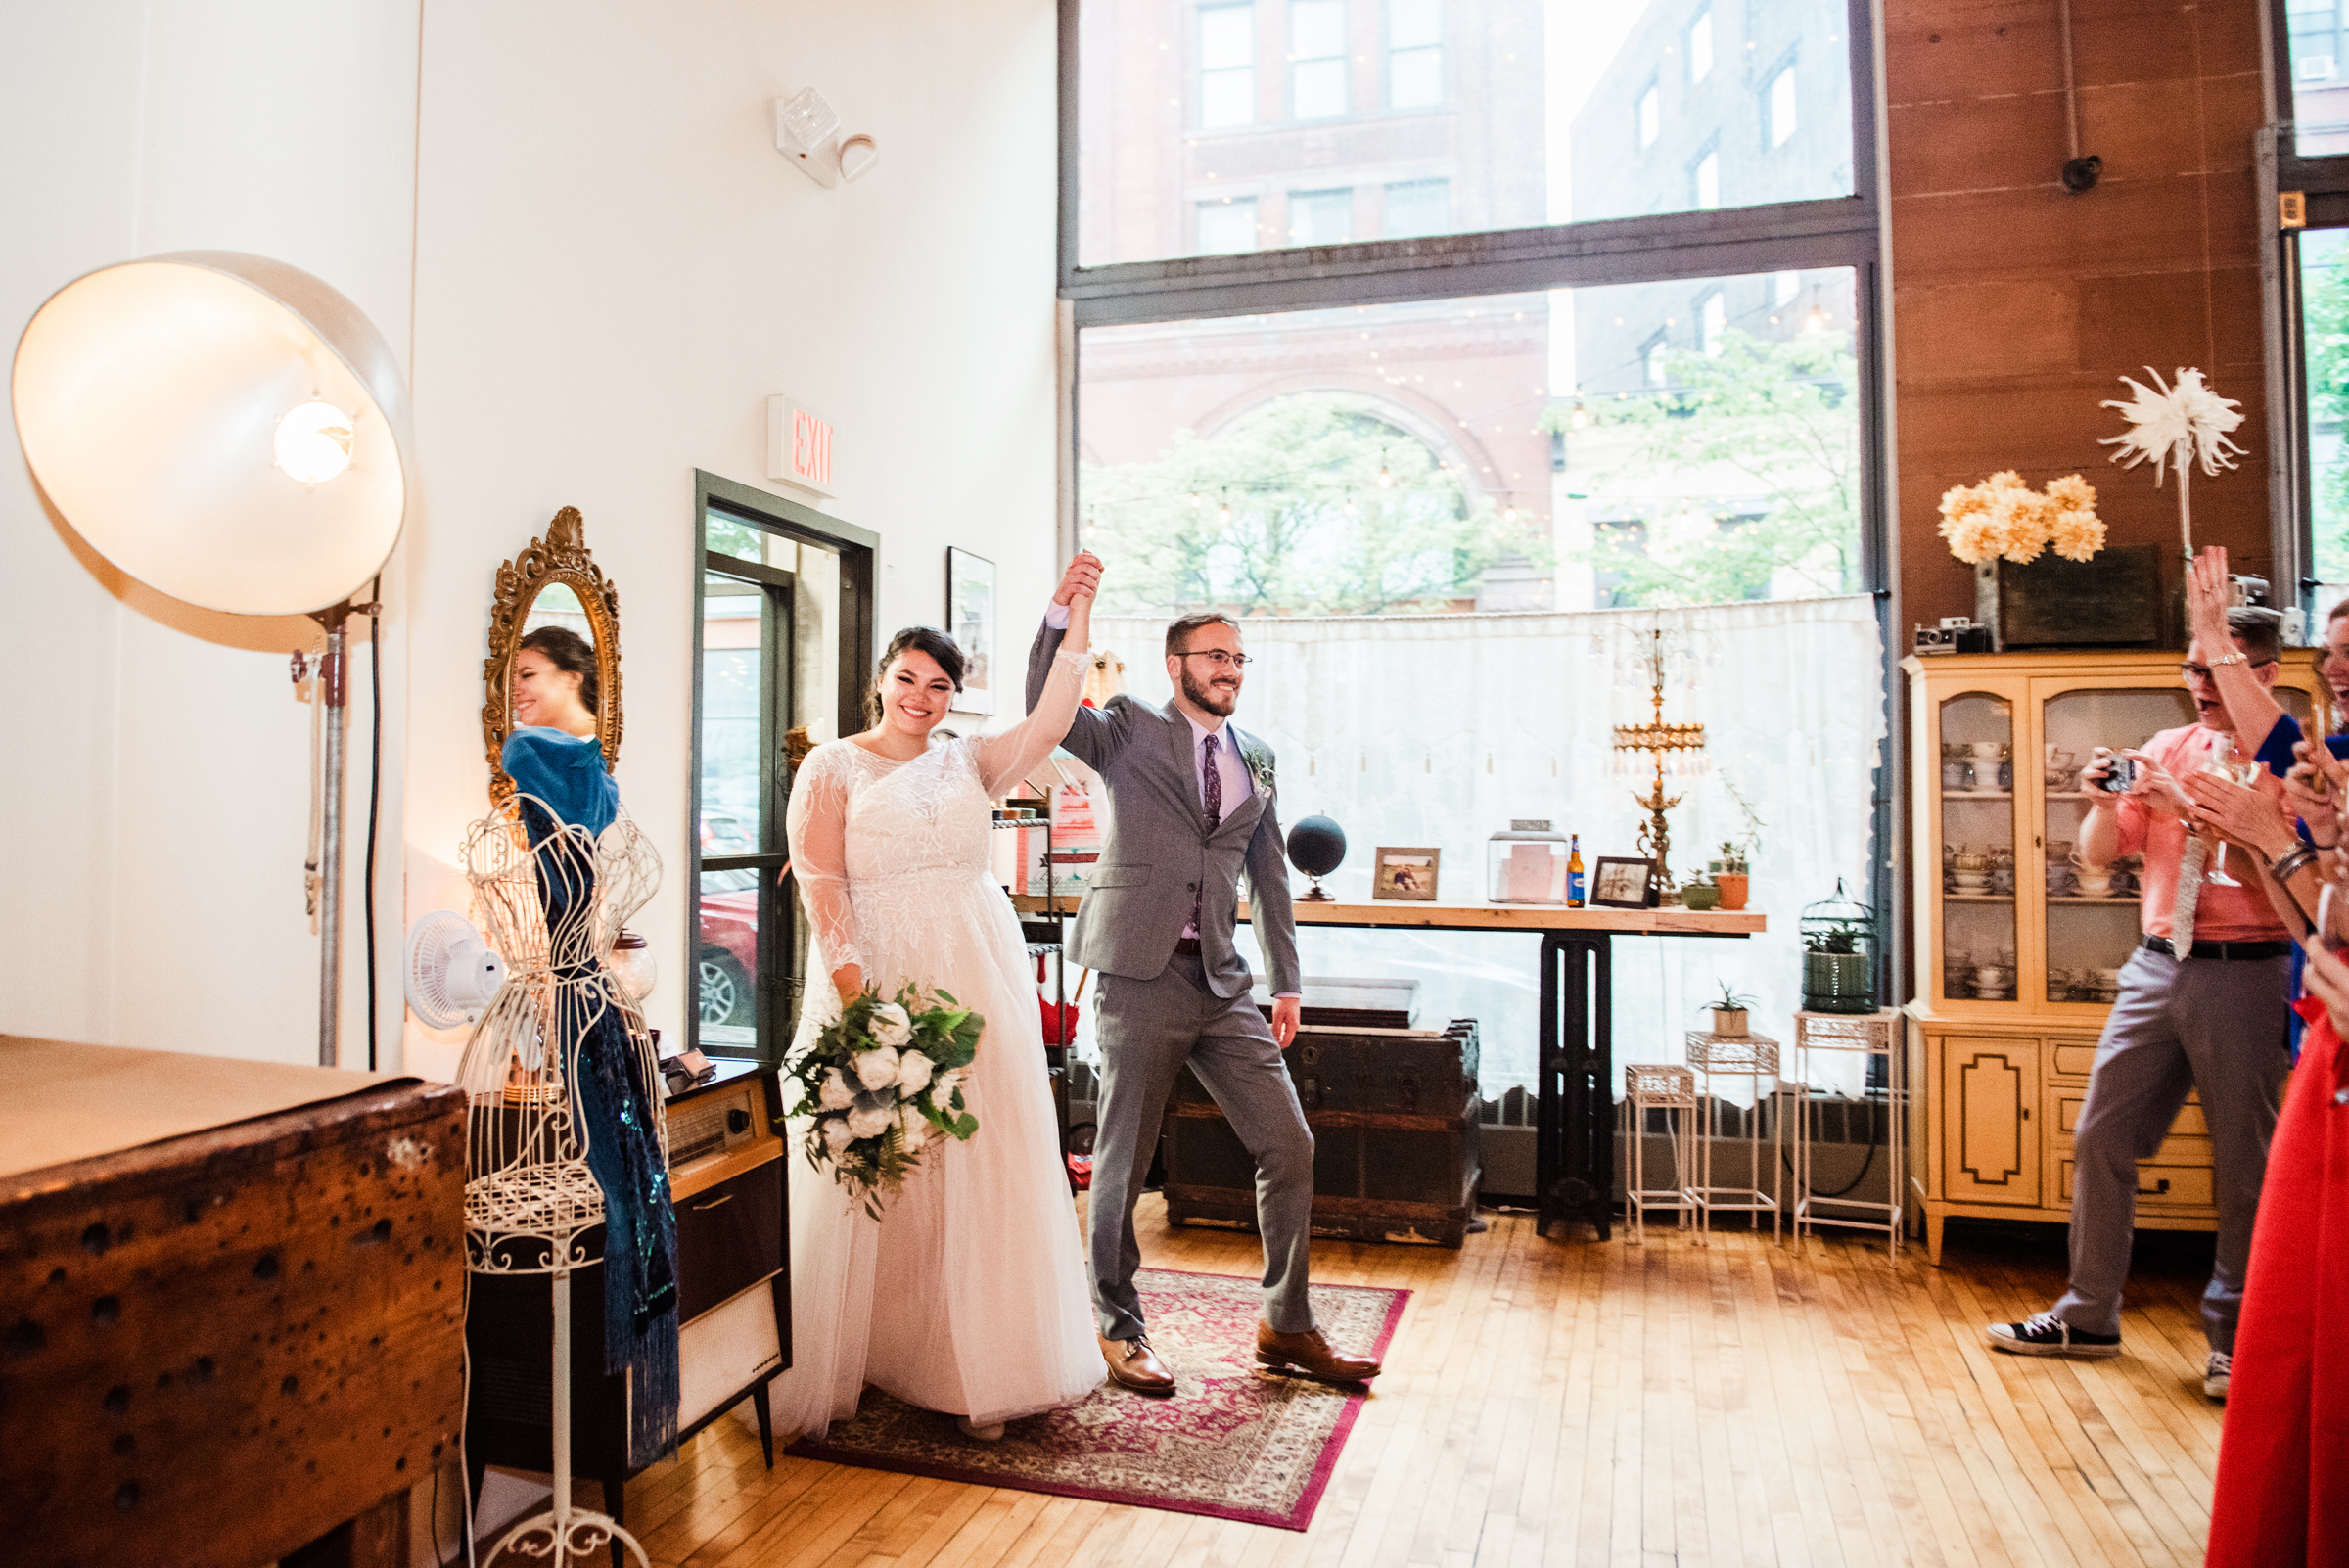 Studio_180_Lamberton_Conservatory_Rochester_Wedding_JILL_STUDIO_Rochester_NY_Photographer_DSC_9116.jpg